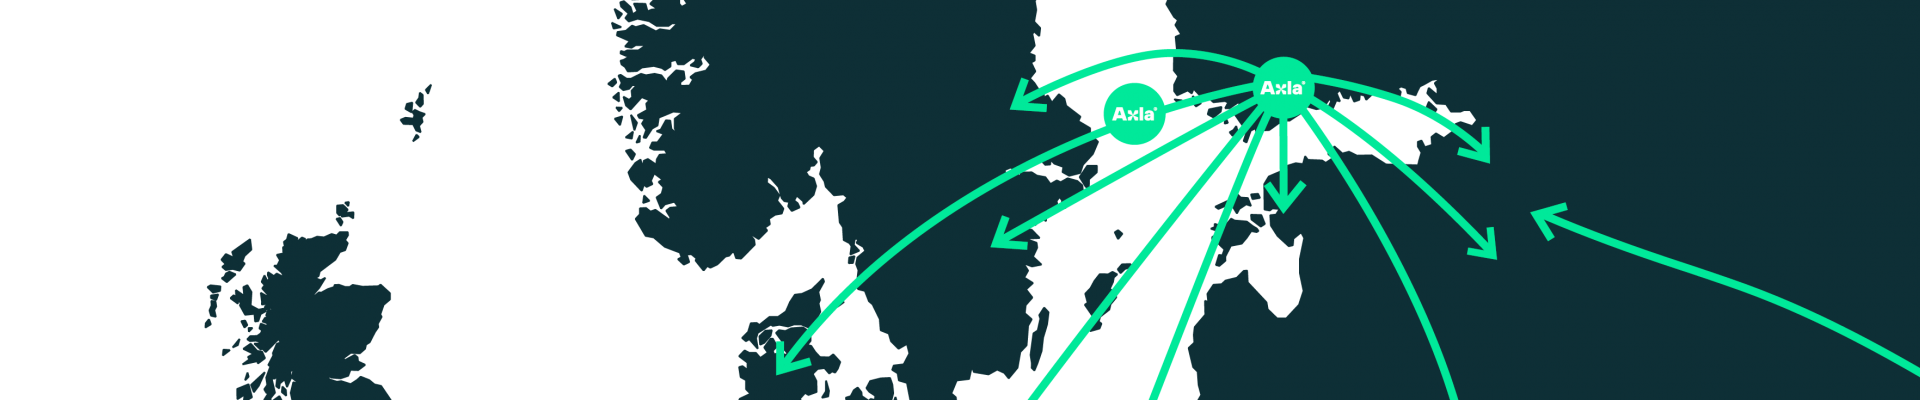 Axla globalt nätverk